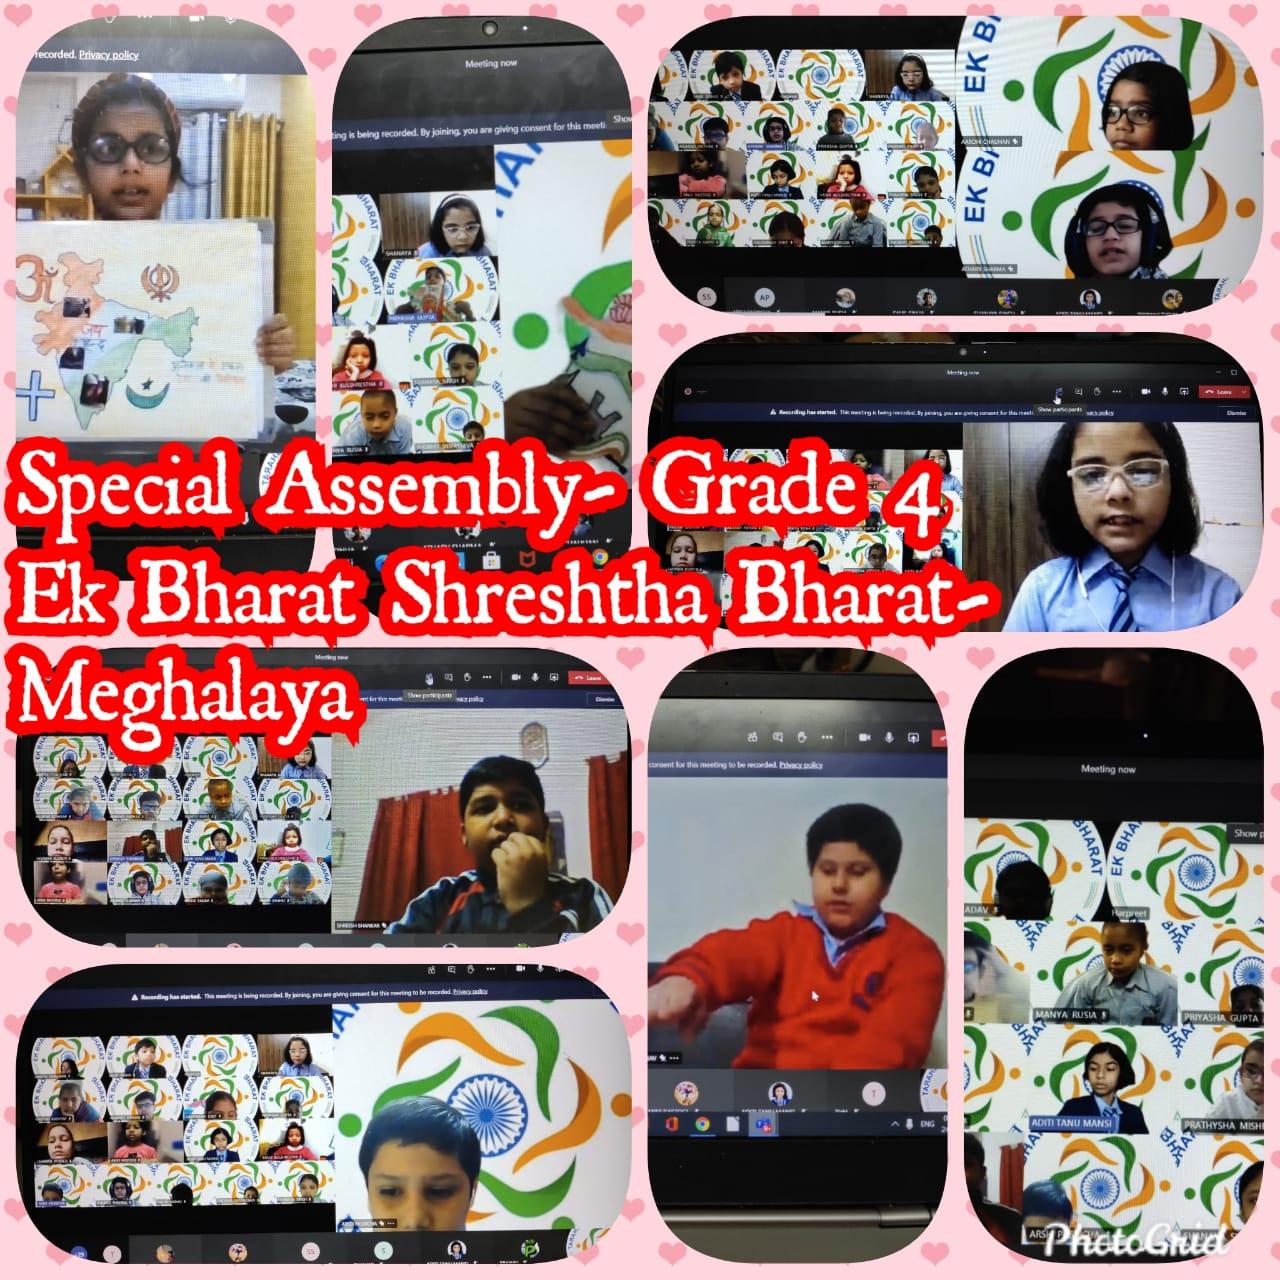 Special Assembly on ËK BAHRAT SHRESTHA BHARAT-2020